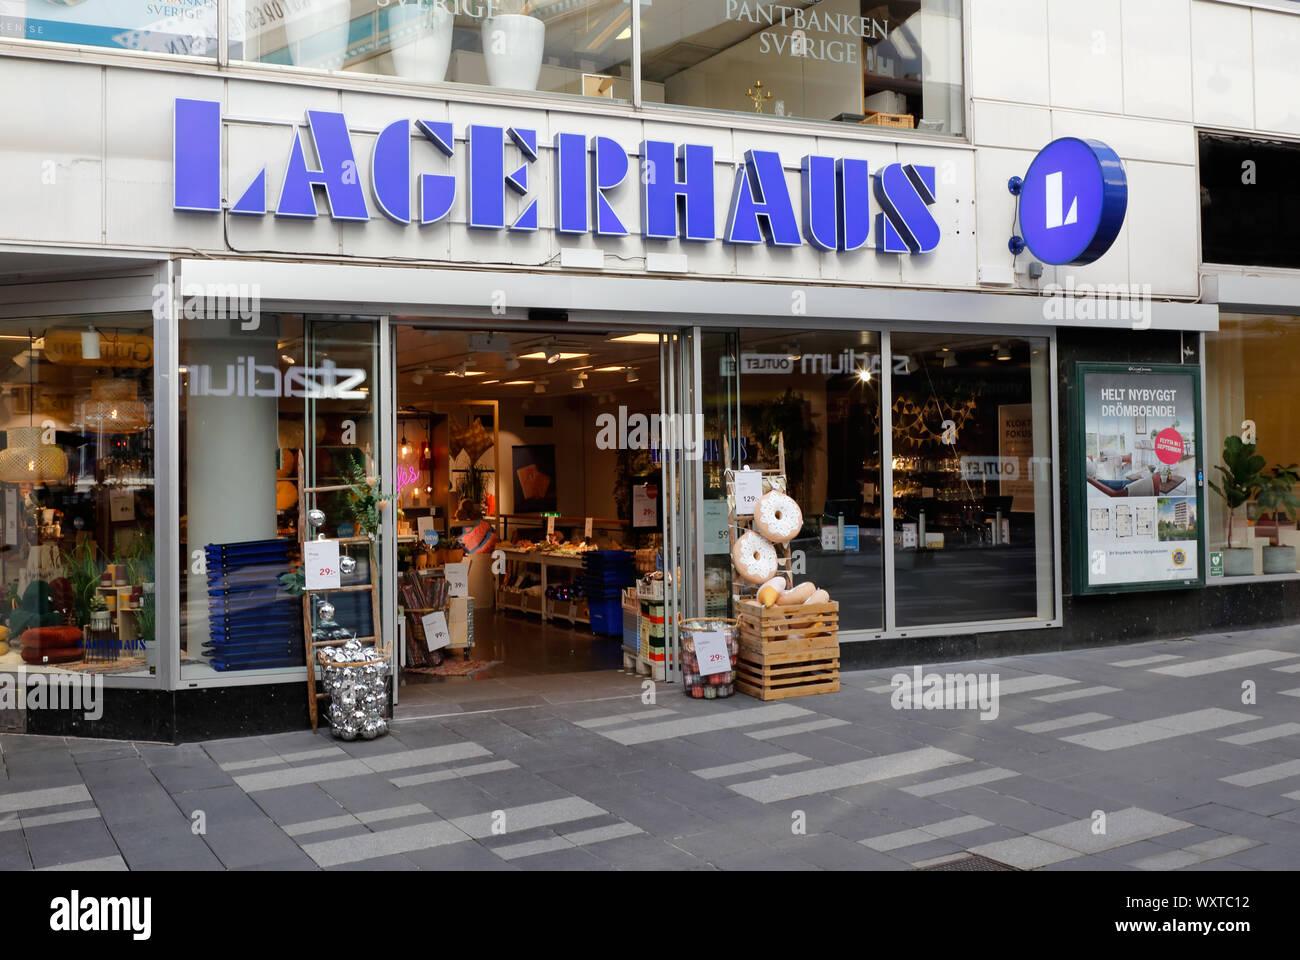 Stockholm, Sweden - September 10, 2019: The Lagerhaus home decoration store located at the Sergelarkaden street. Stock Photo